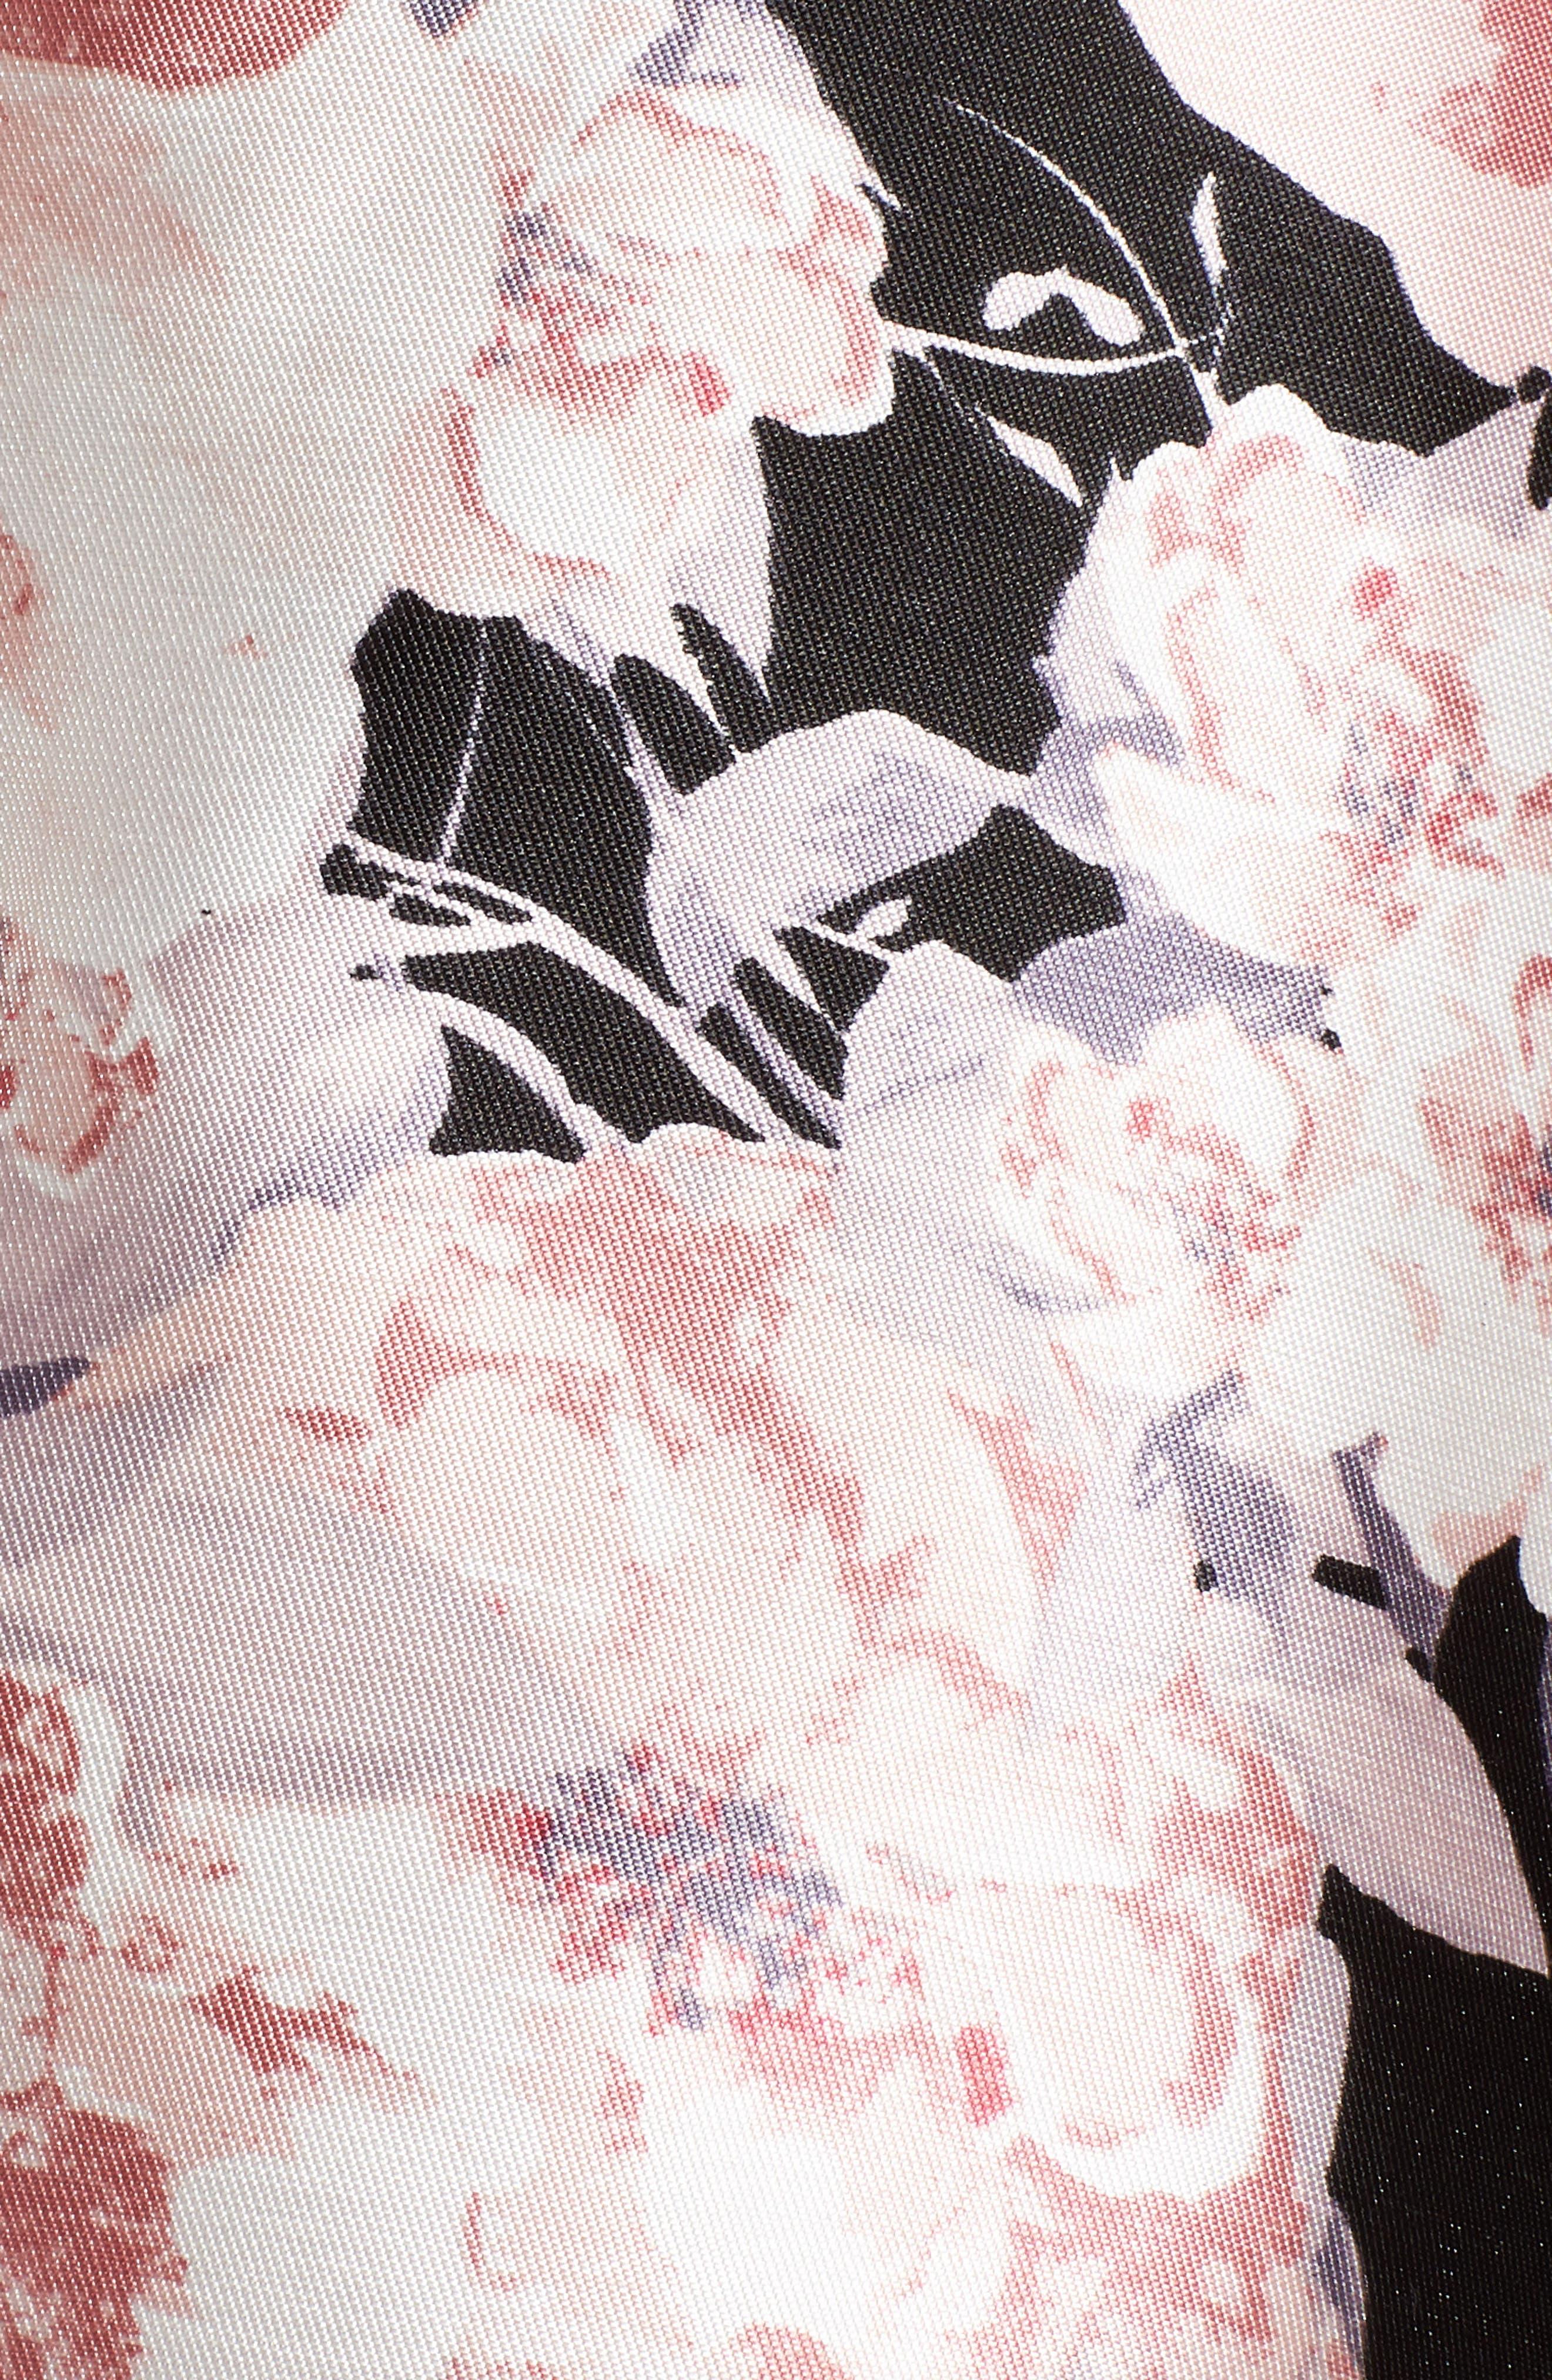 Mikado Skater Dress,                             Alternate thumbnail 5, color,                             001